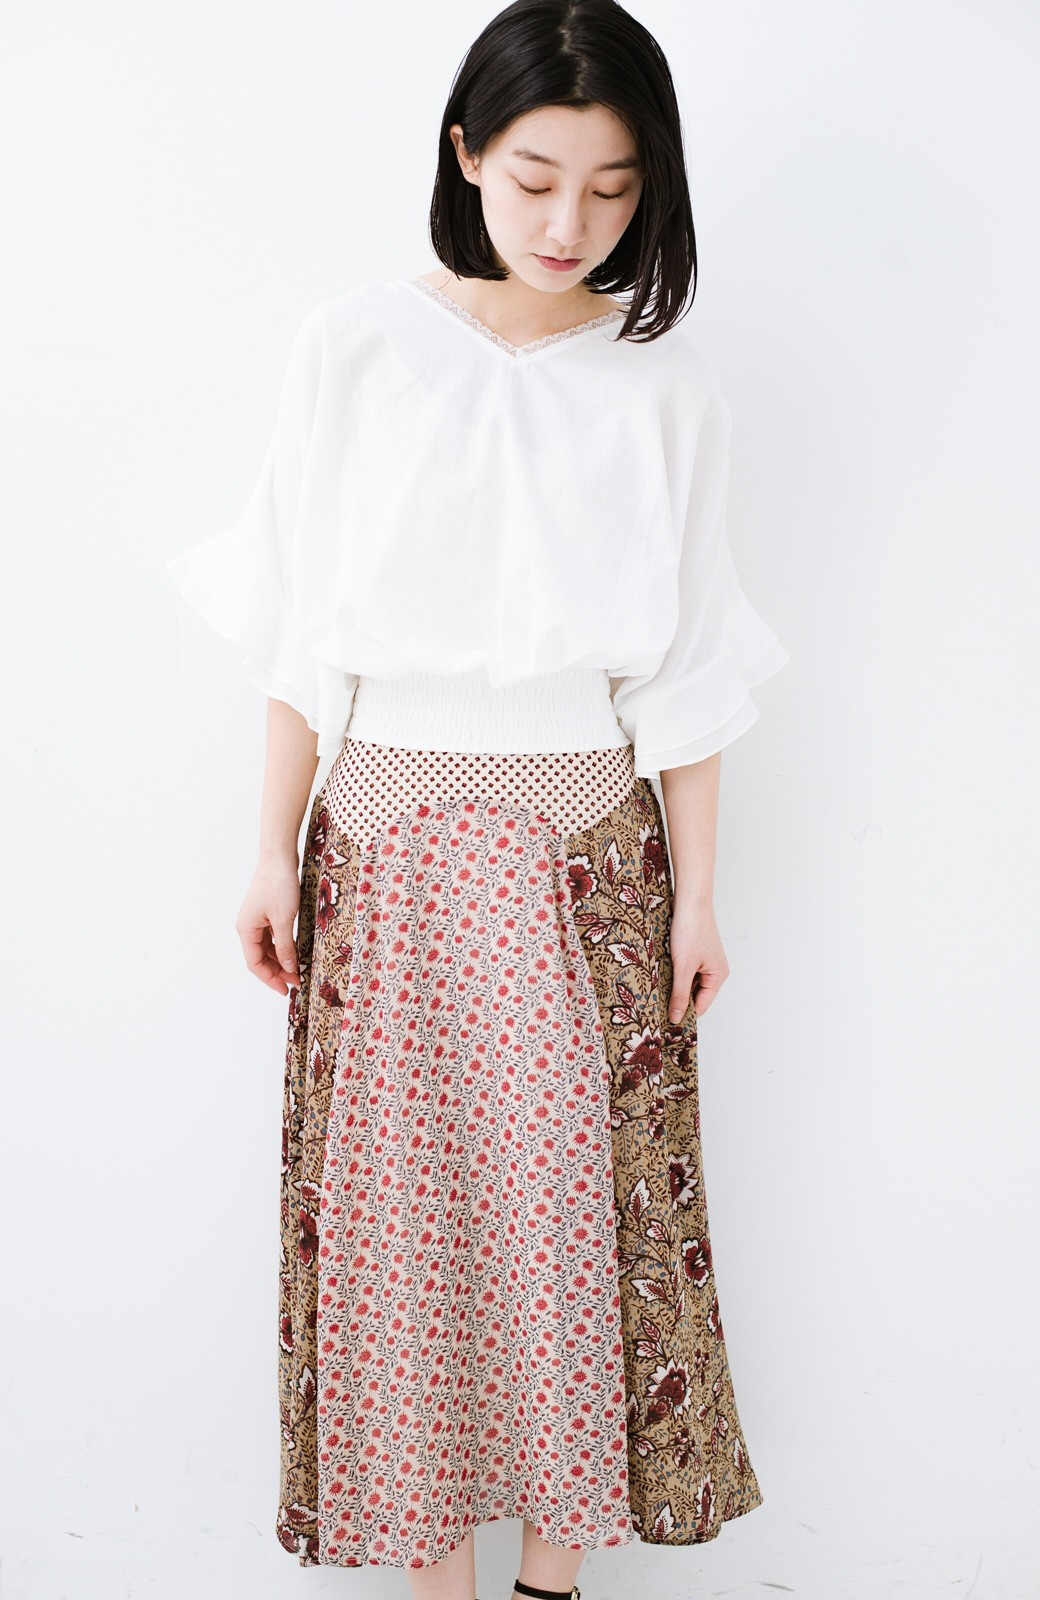 haco! 【洗濯機洗いOK】シンプルなトップスに合わせるだけでかわいくなれる MIX柄スカート <ベージュ系その他>の商品写真20